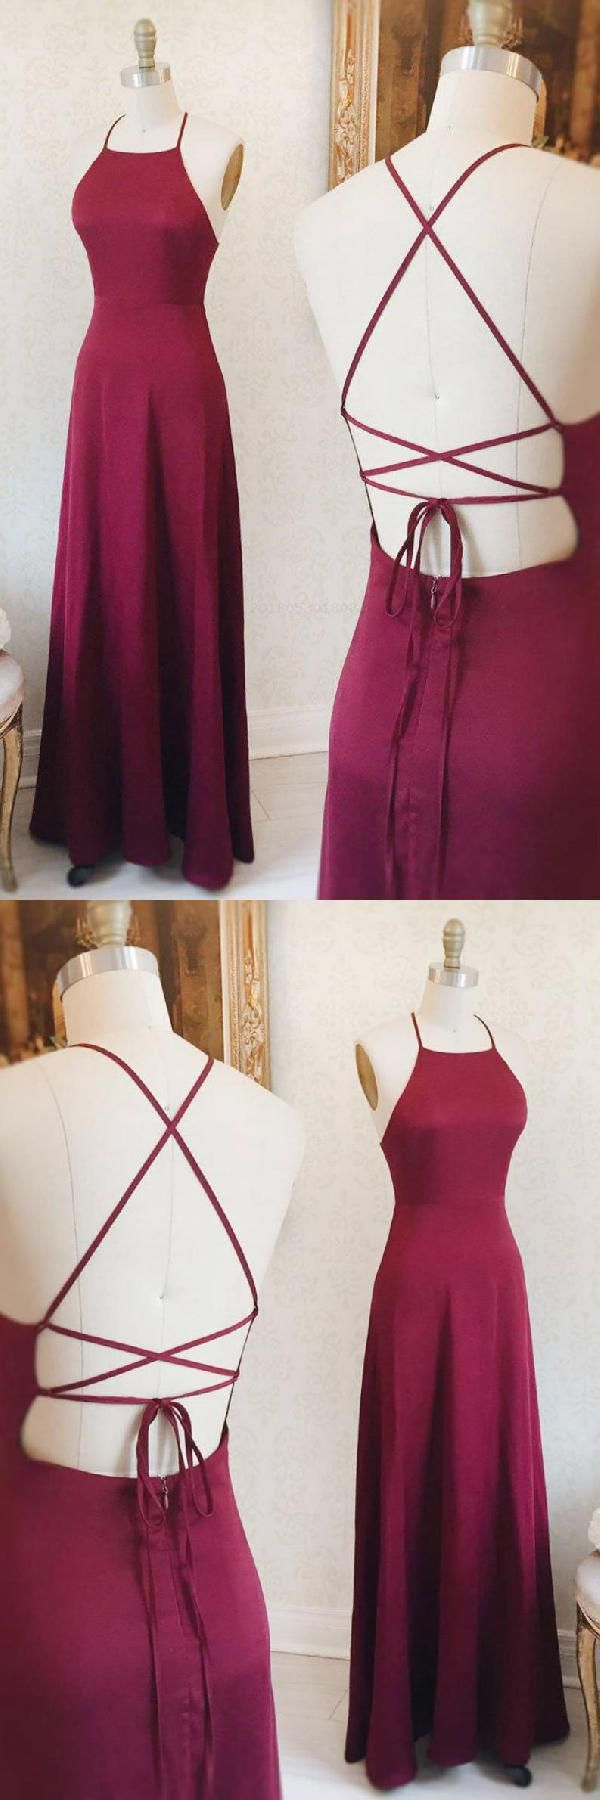 Simple prom dresses burgundy prom dresses prom dresses long